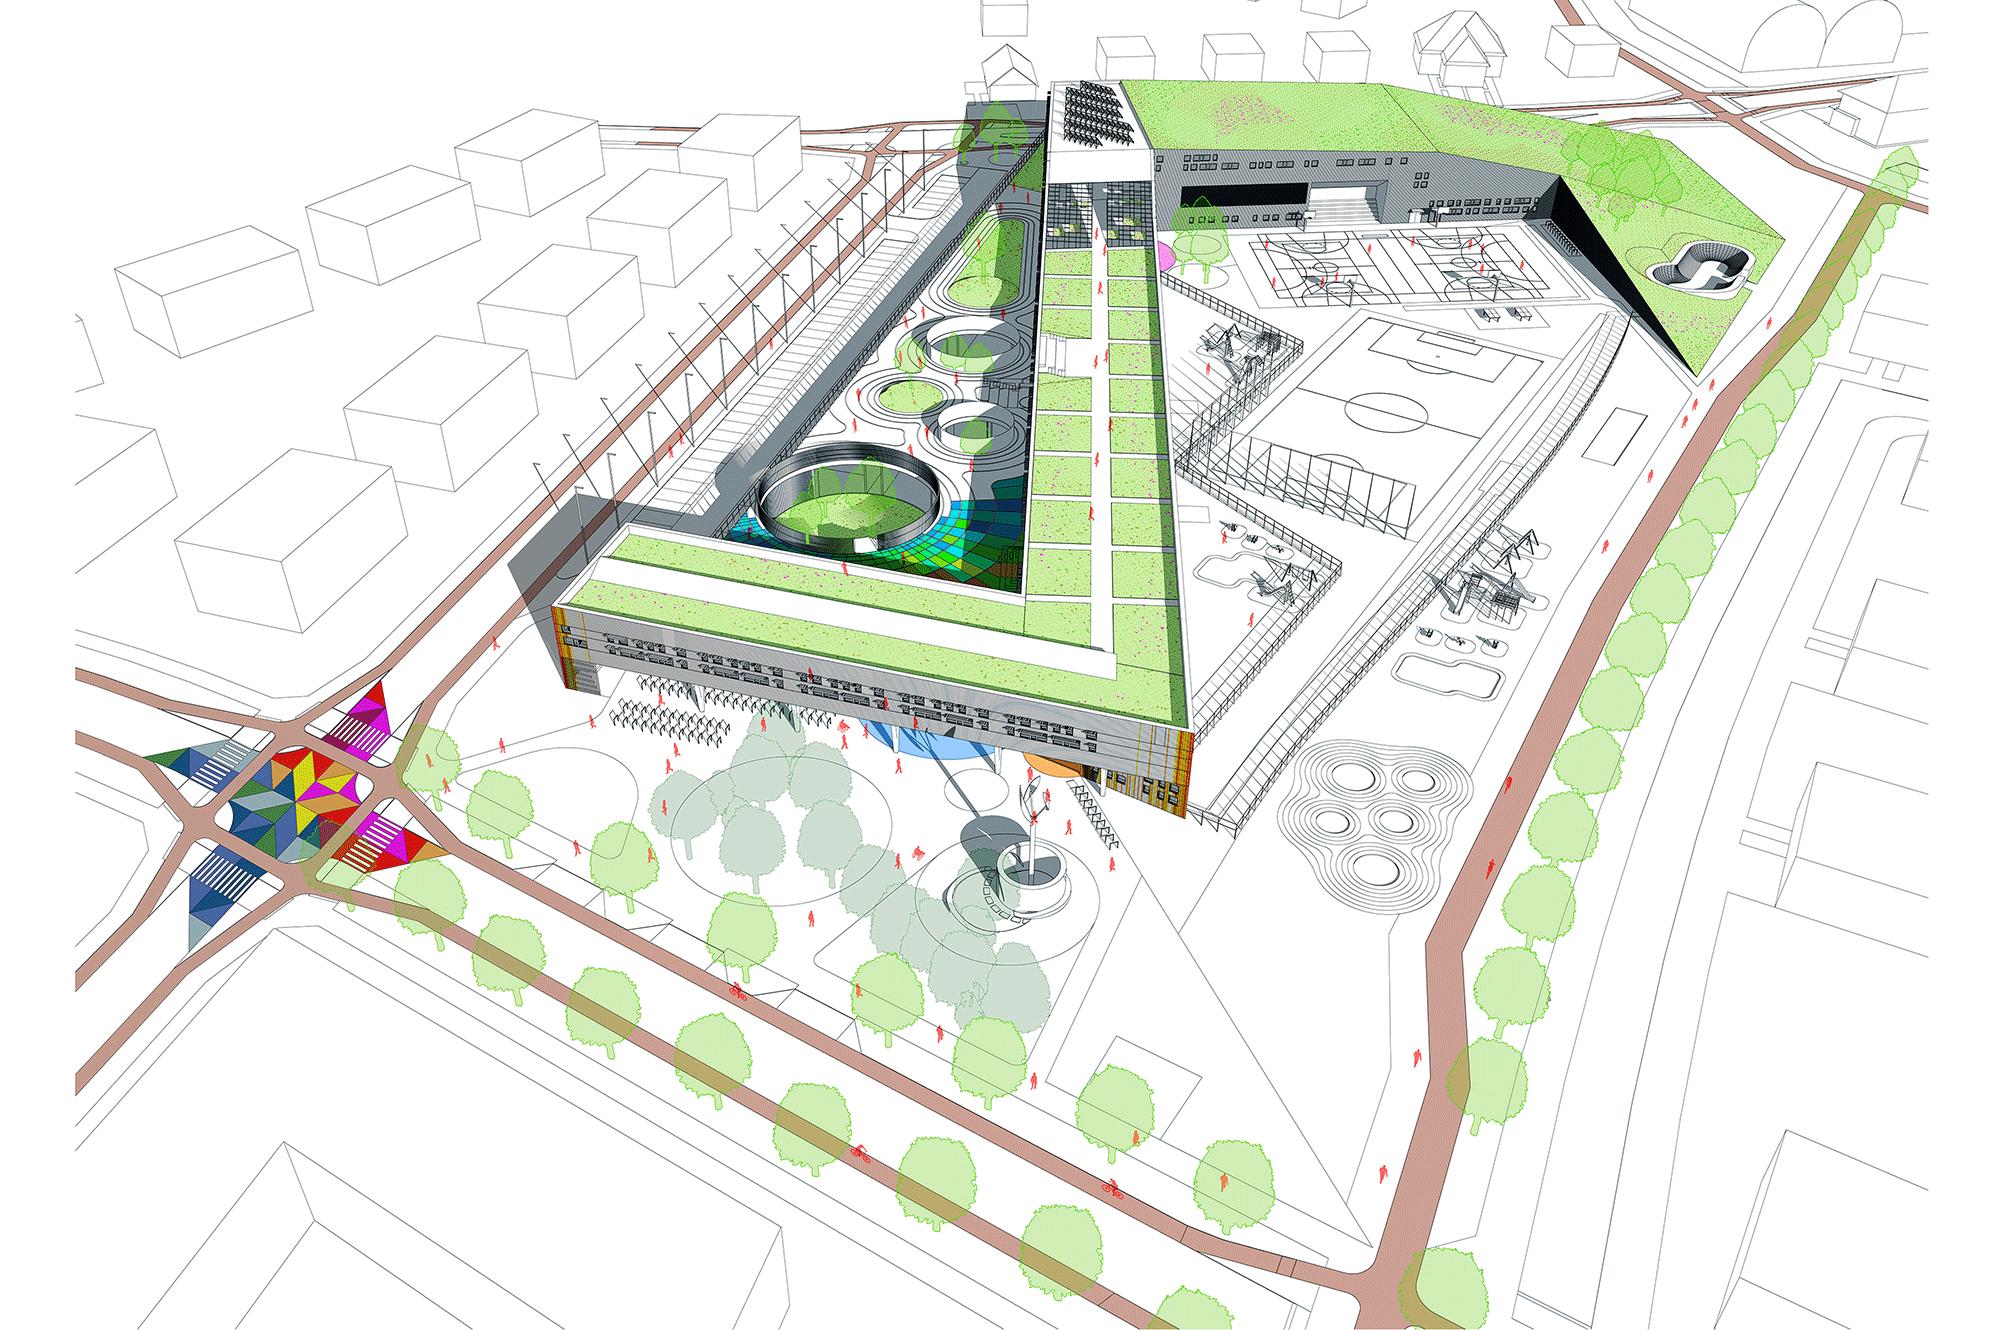 Elementary school, kindergarten and sports complex at Cynamonowa Street in Wrocław.